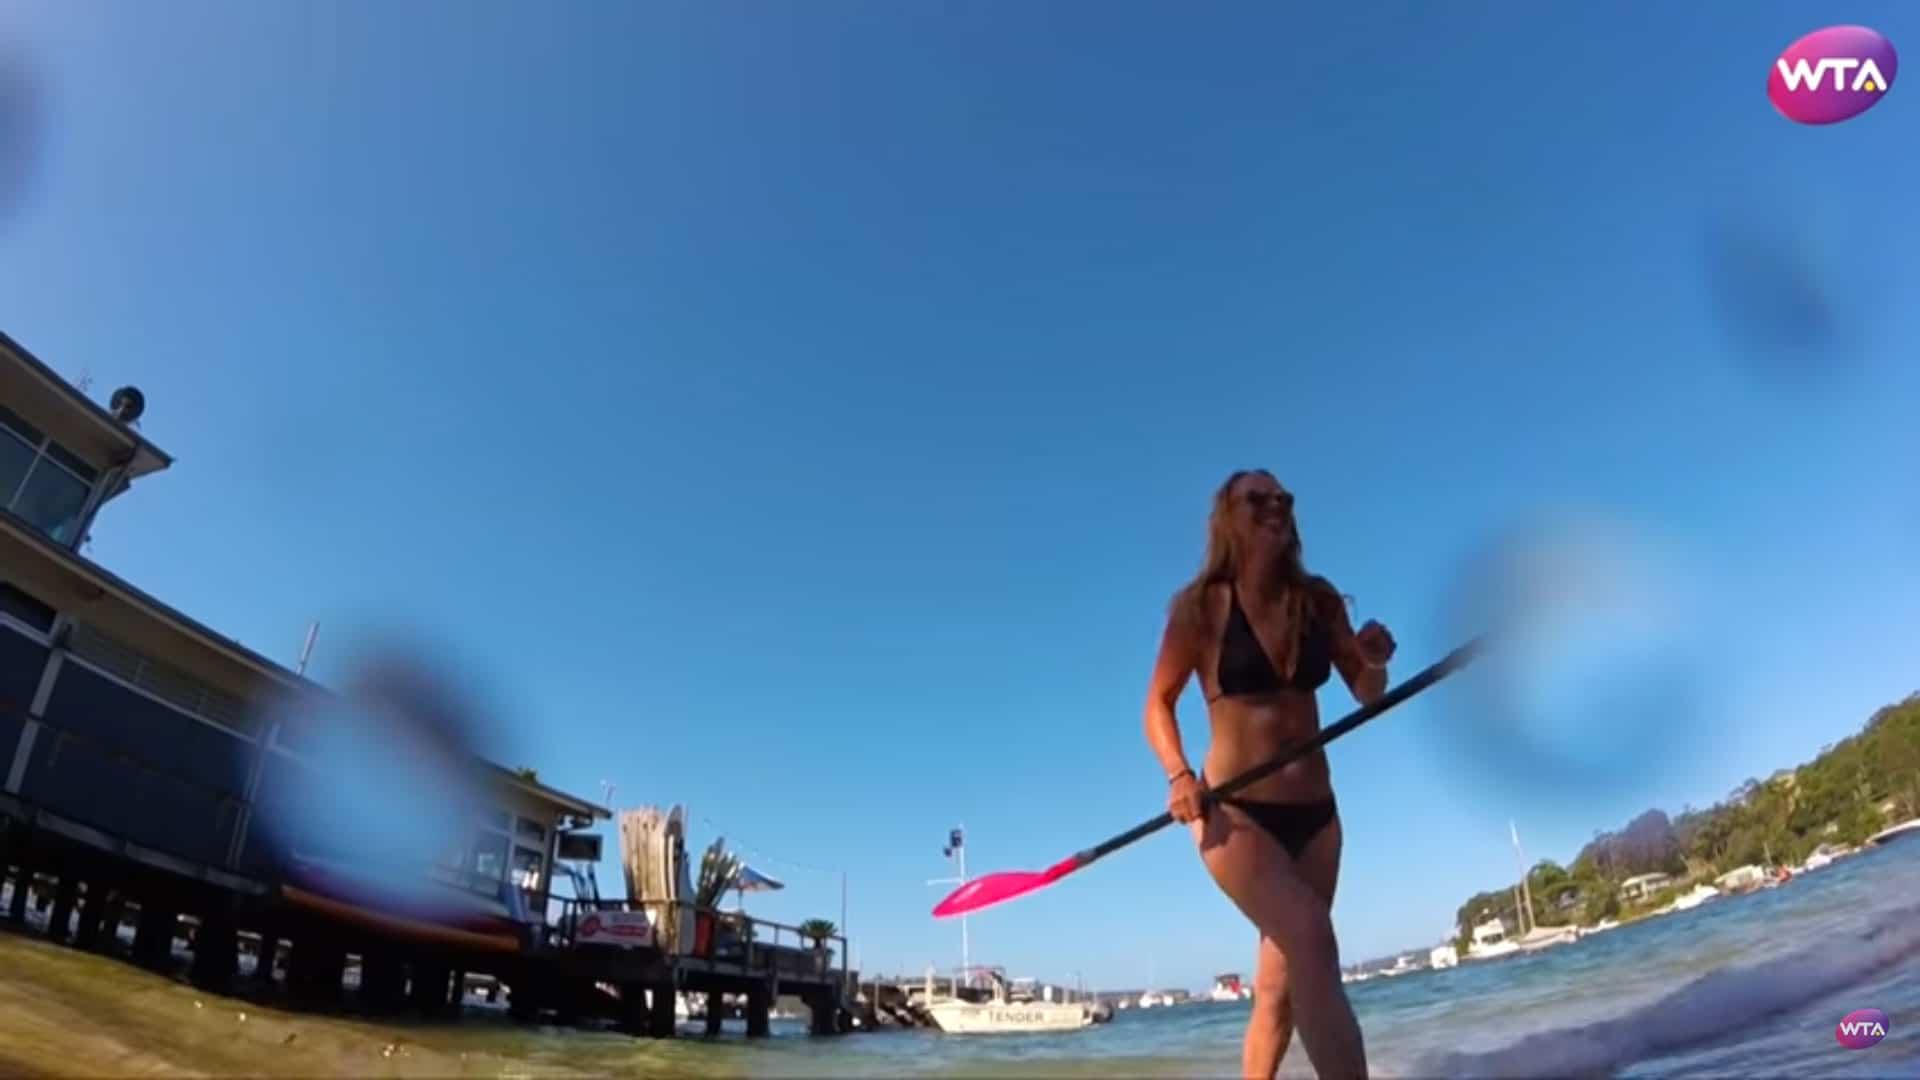 La championne de tennis Caroline Wozniacki essaye le stand up paddle